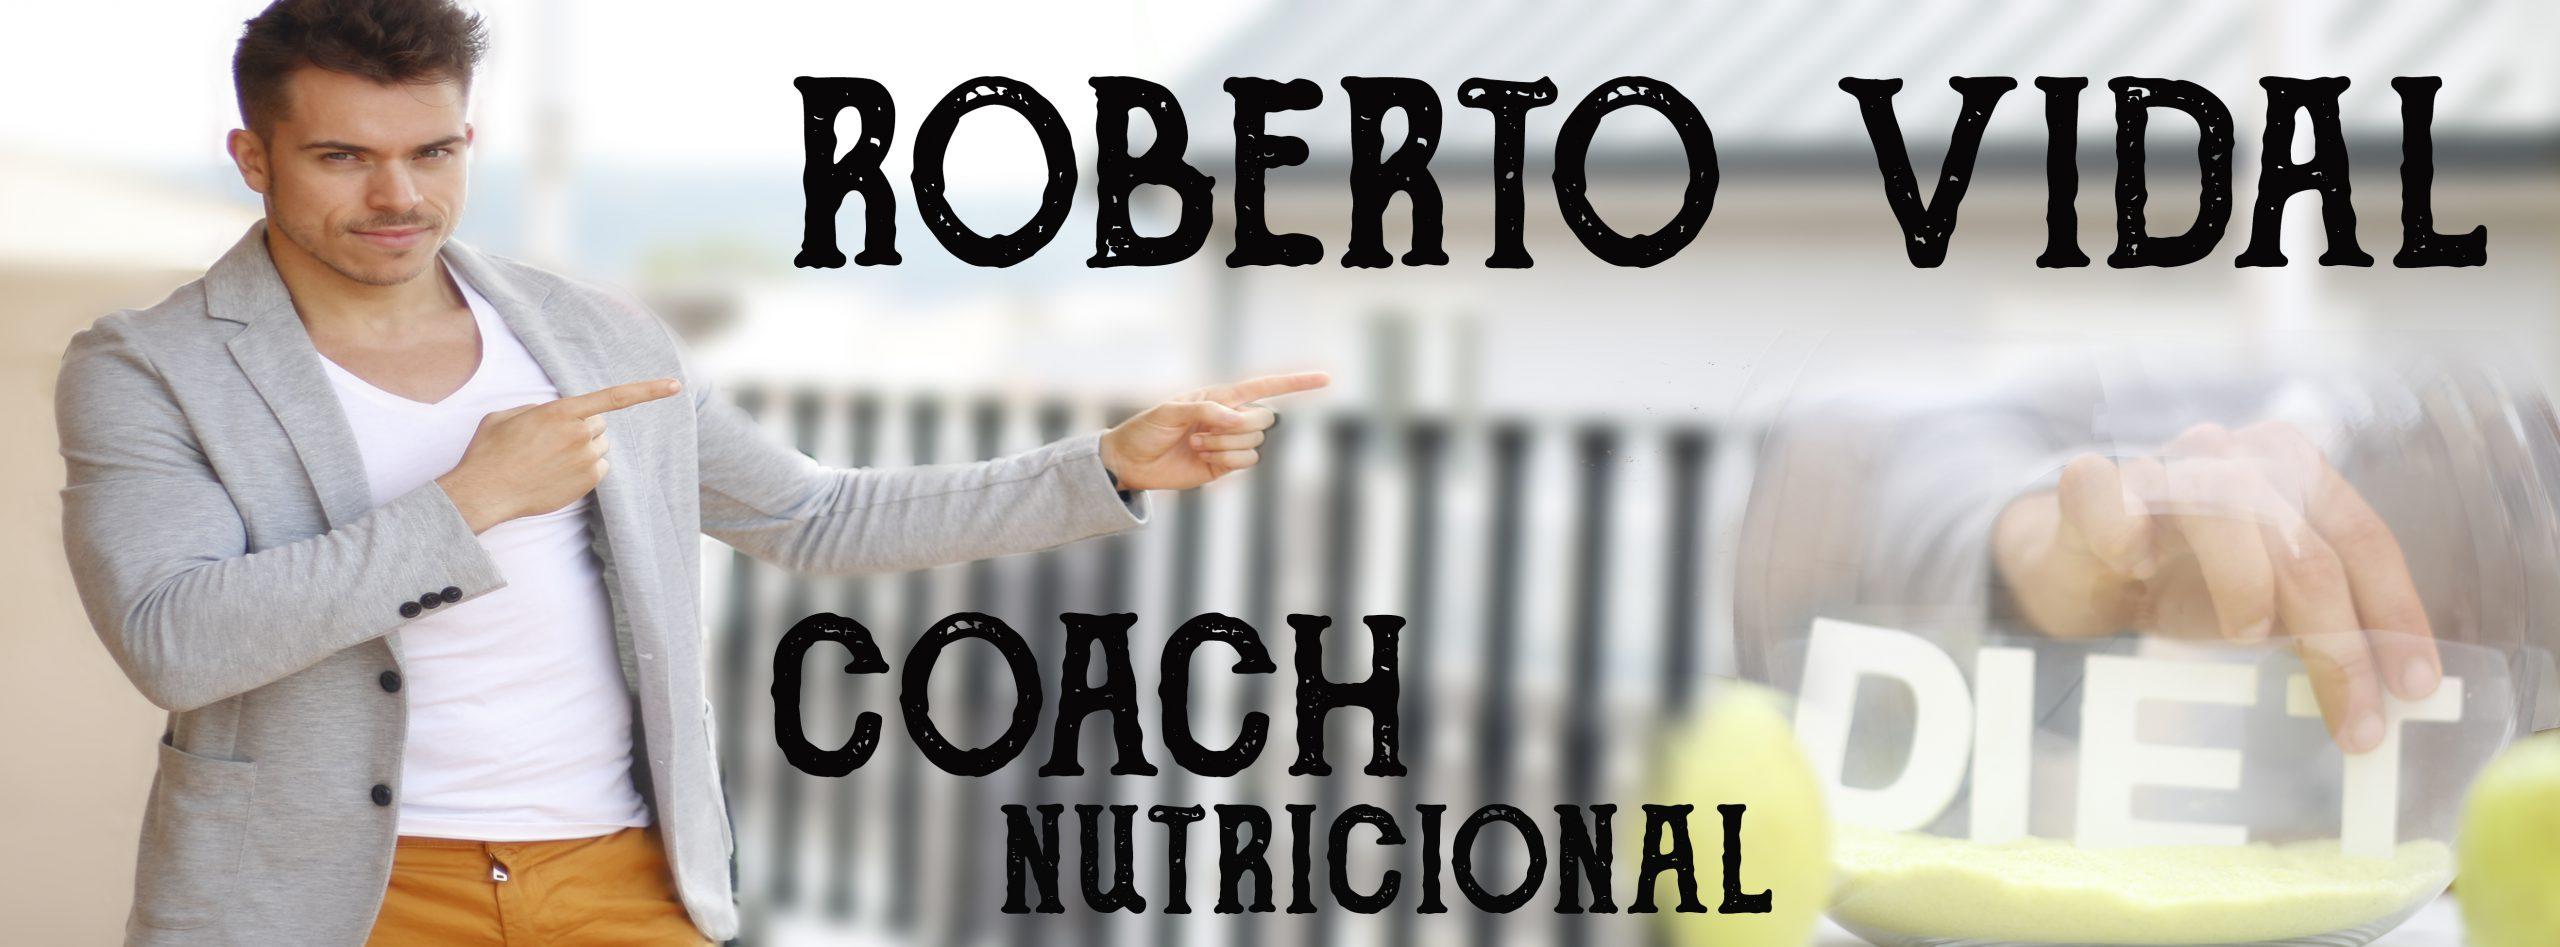 Roberto-vidal